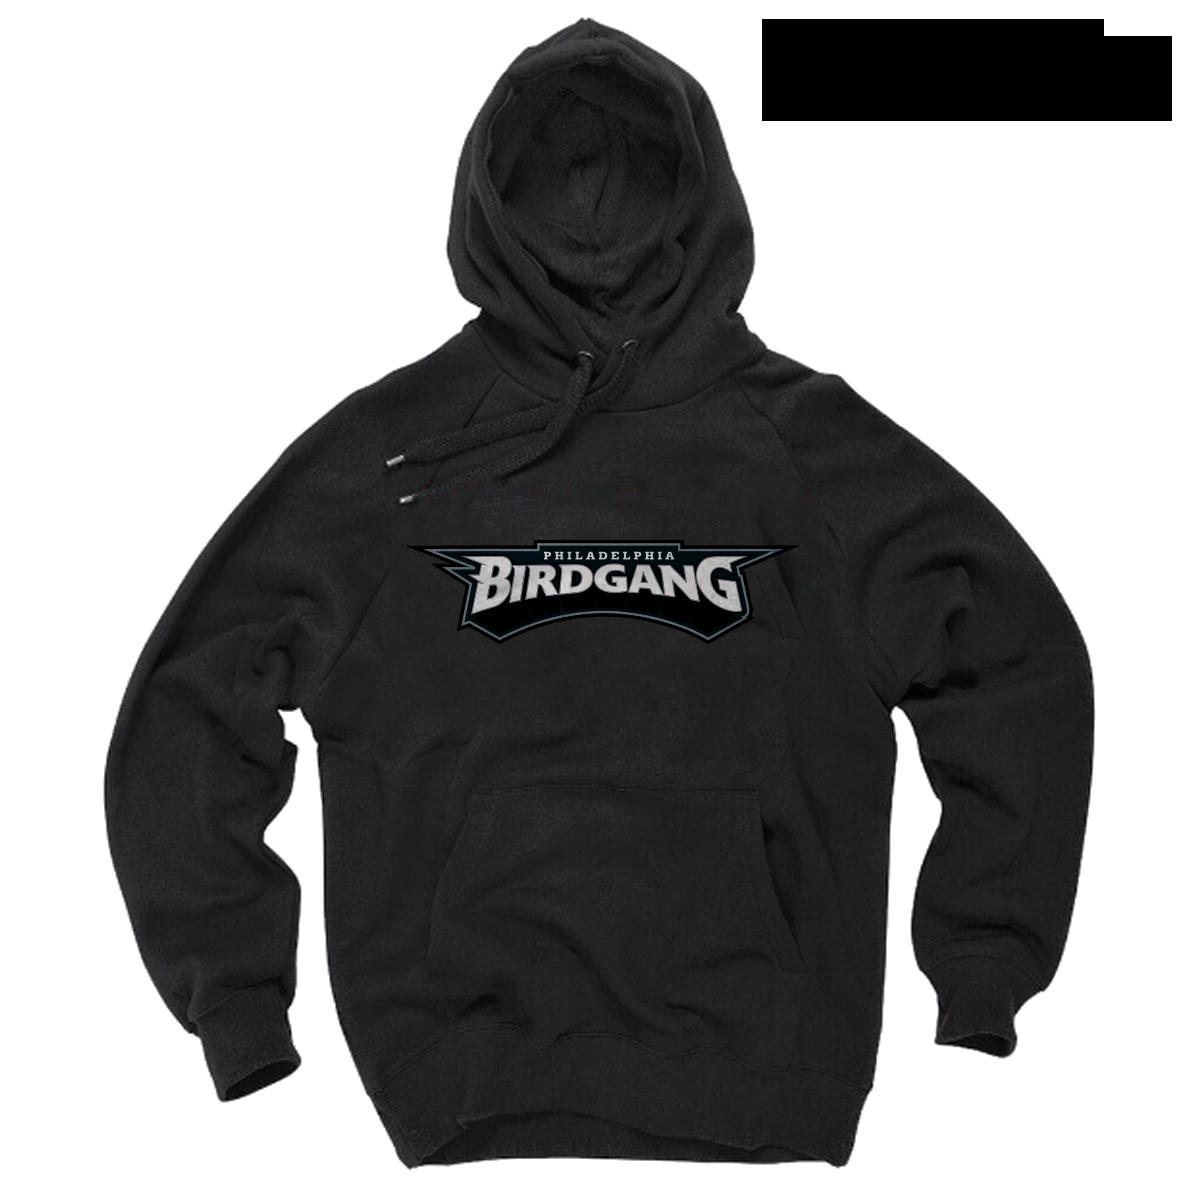 f5e533e94b3 Eagles Hoodie - Philadelphia Eagles Bird Gang Black Hoodie